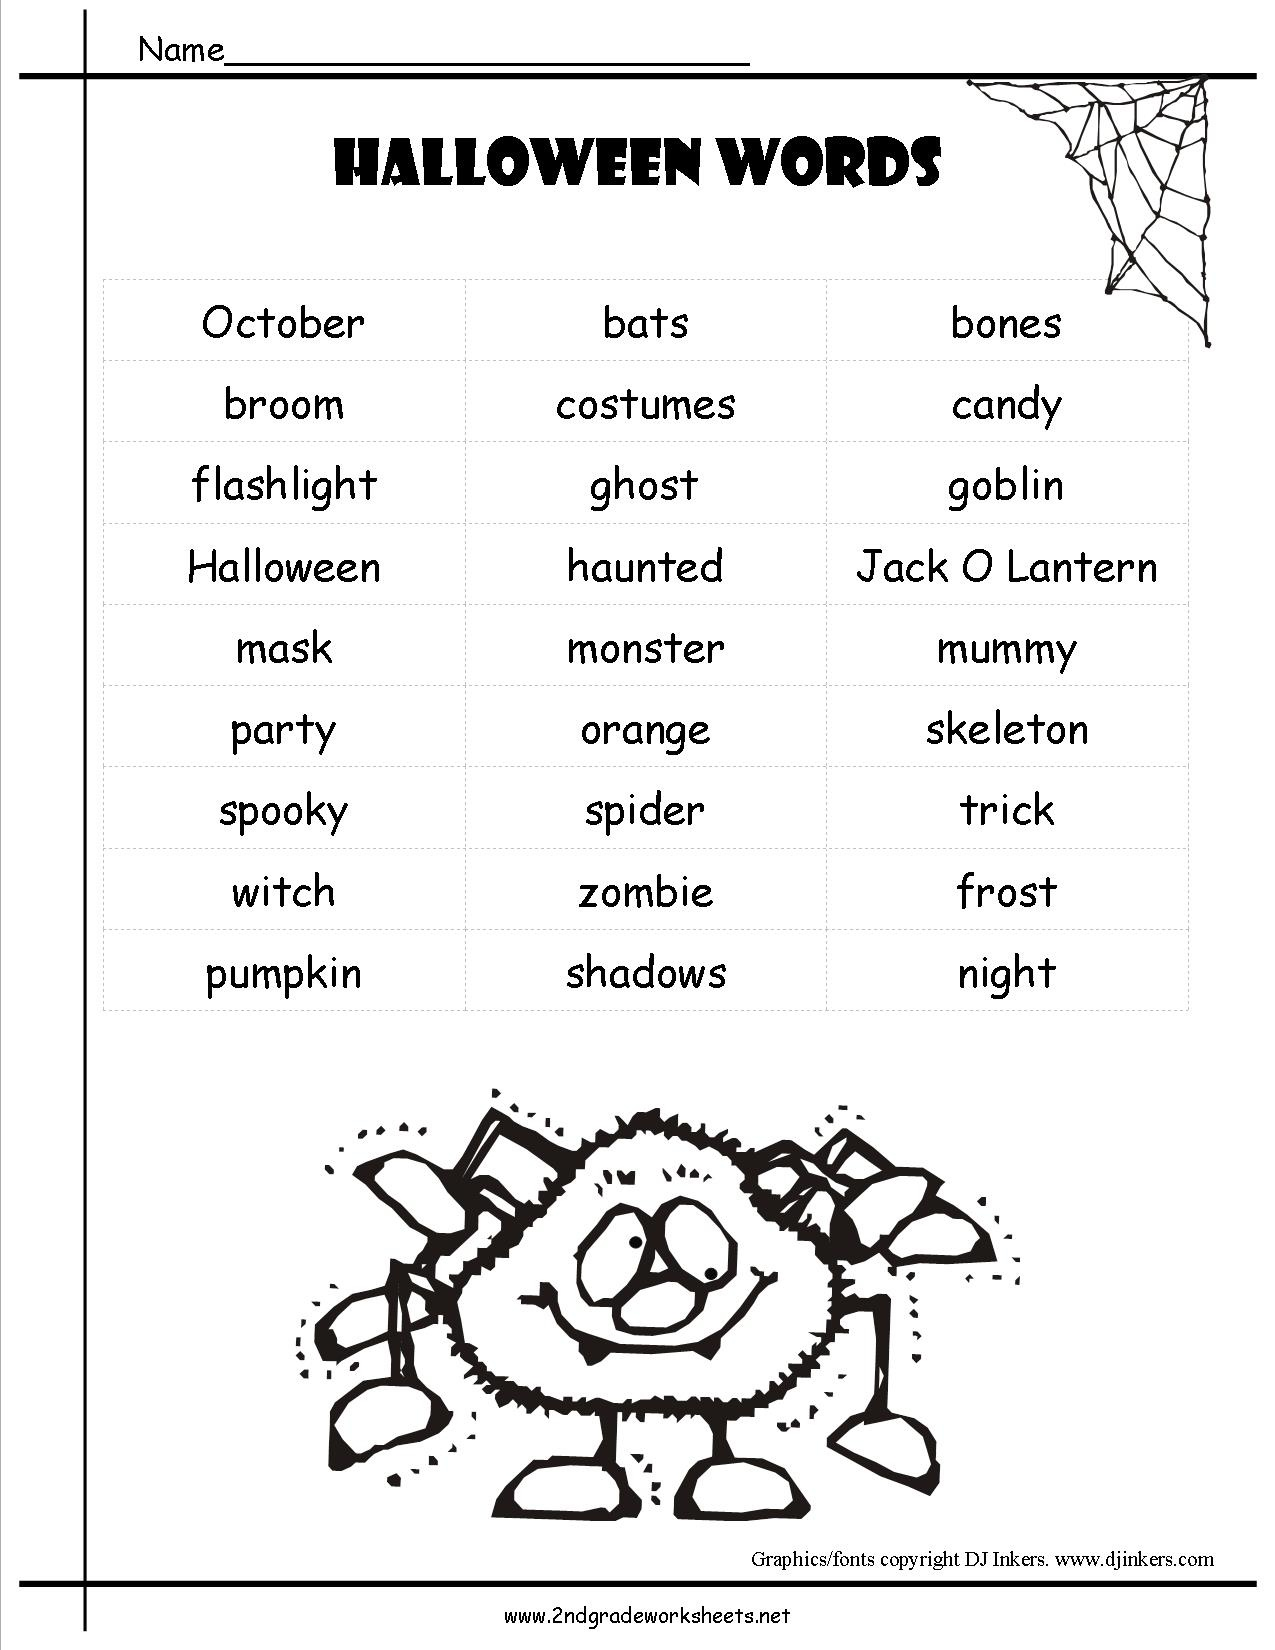 Halloween Worksheets And Printouts - Halloween Worksheets Free Printable